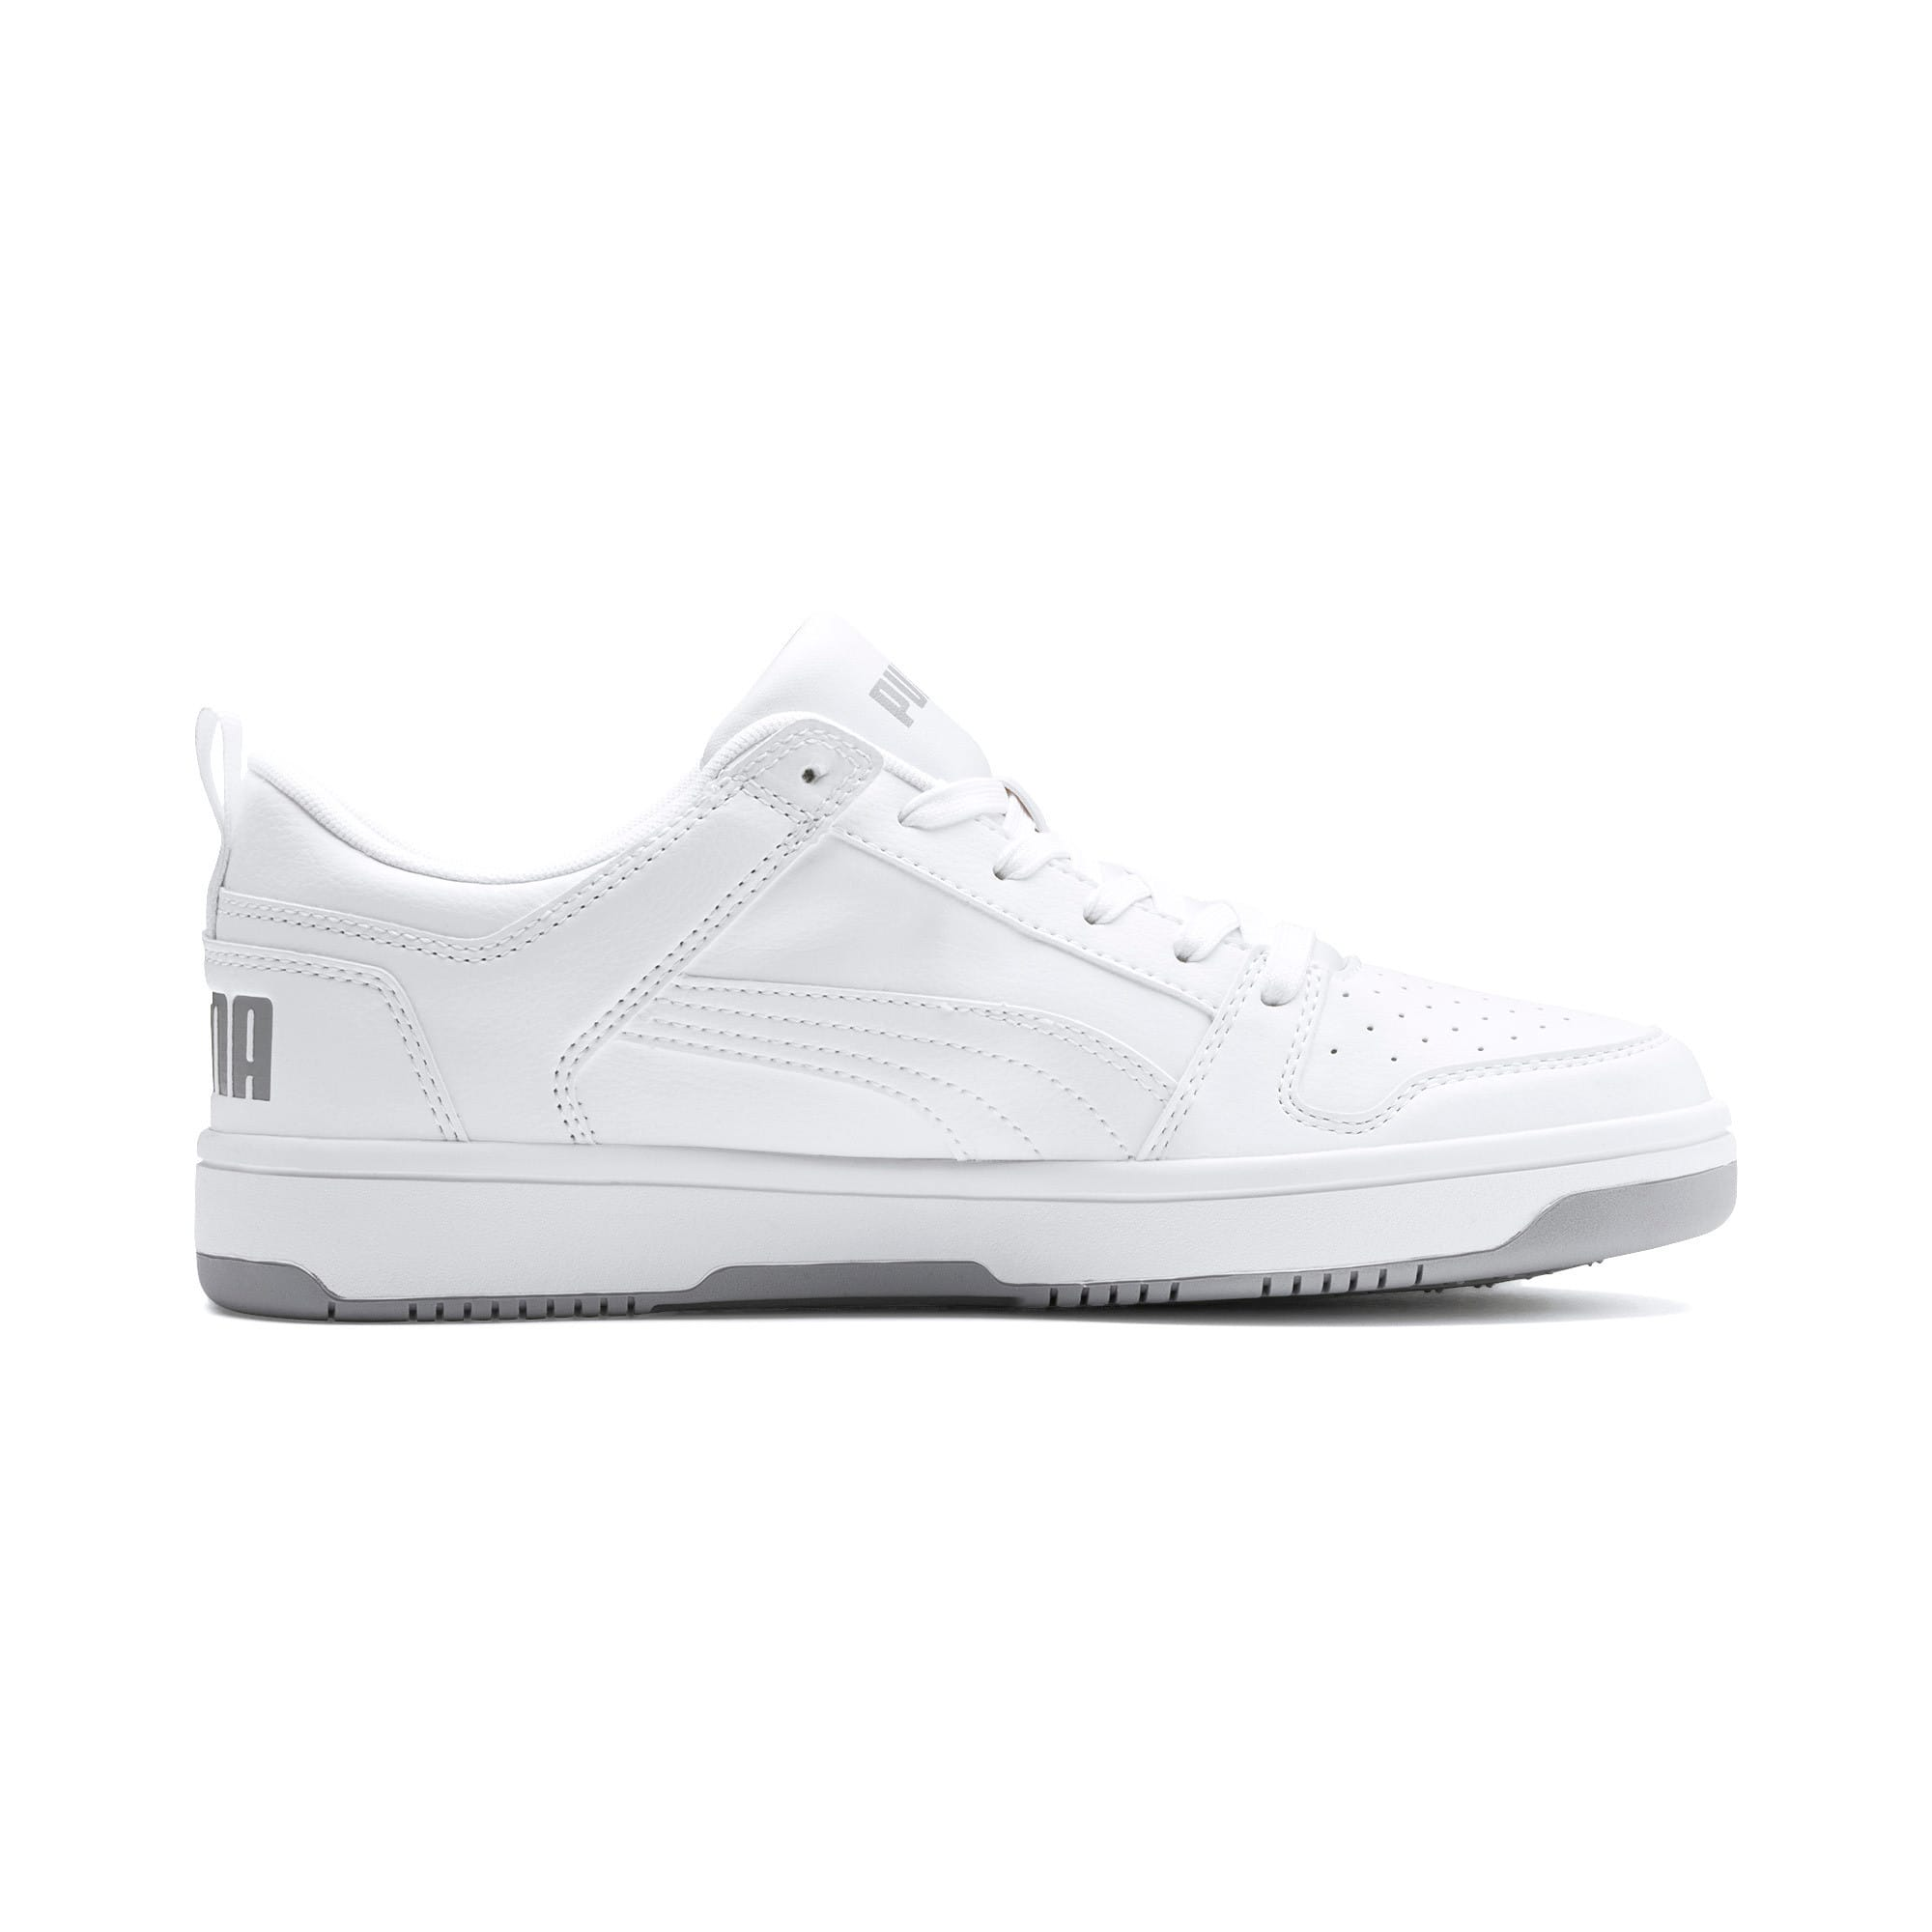 Thumbnail 6 of PUMA Rebound LayUp Lo Sneakers, Puma White-High Rise, medium